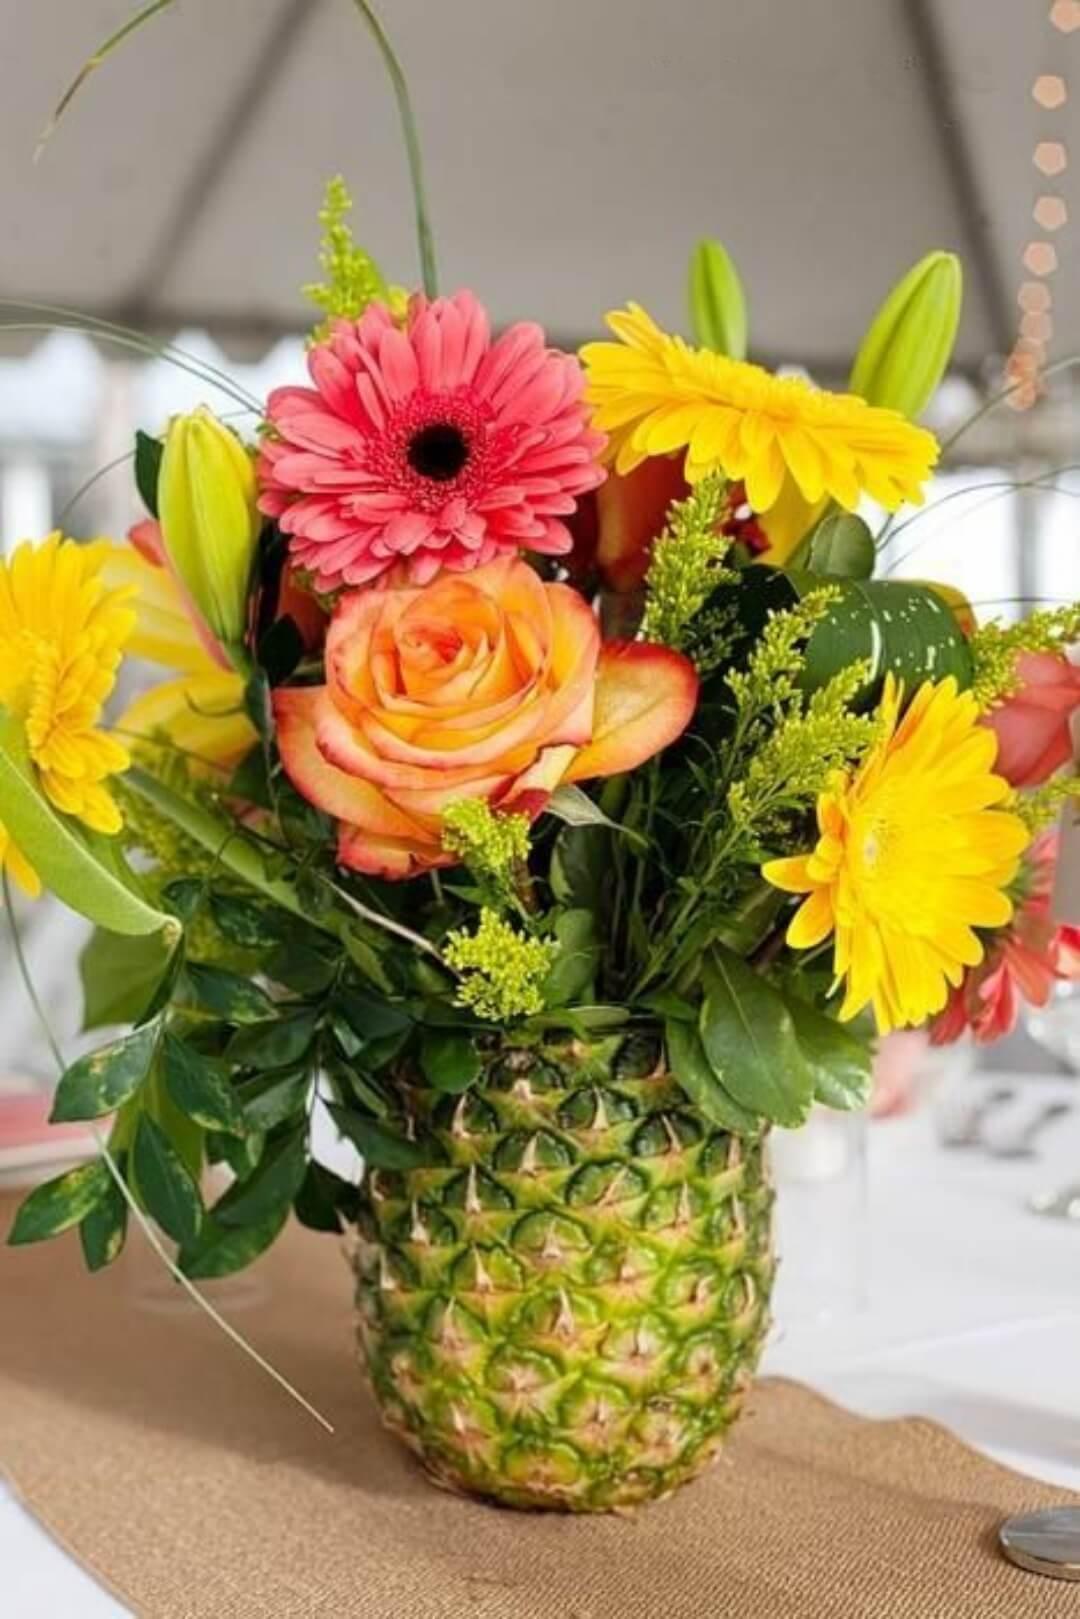 36 Best Flower Arrangement Ideas and Designs for 2017